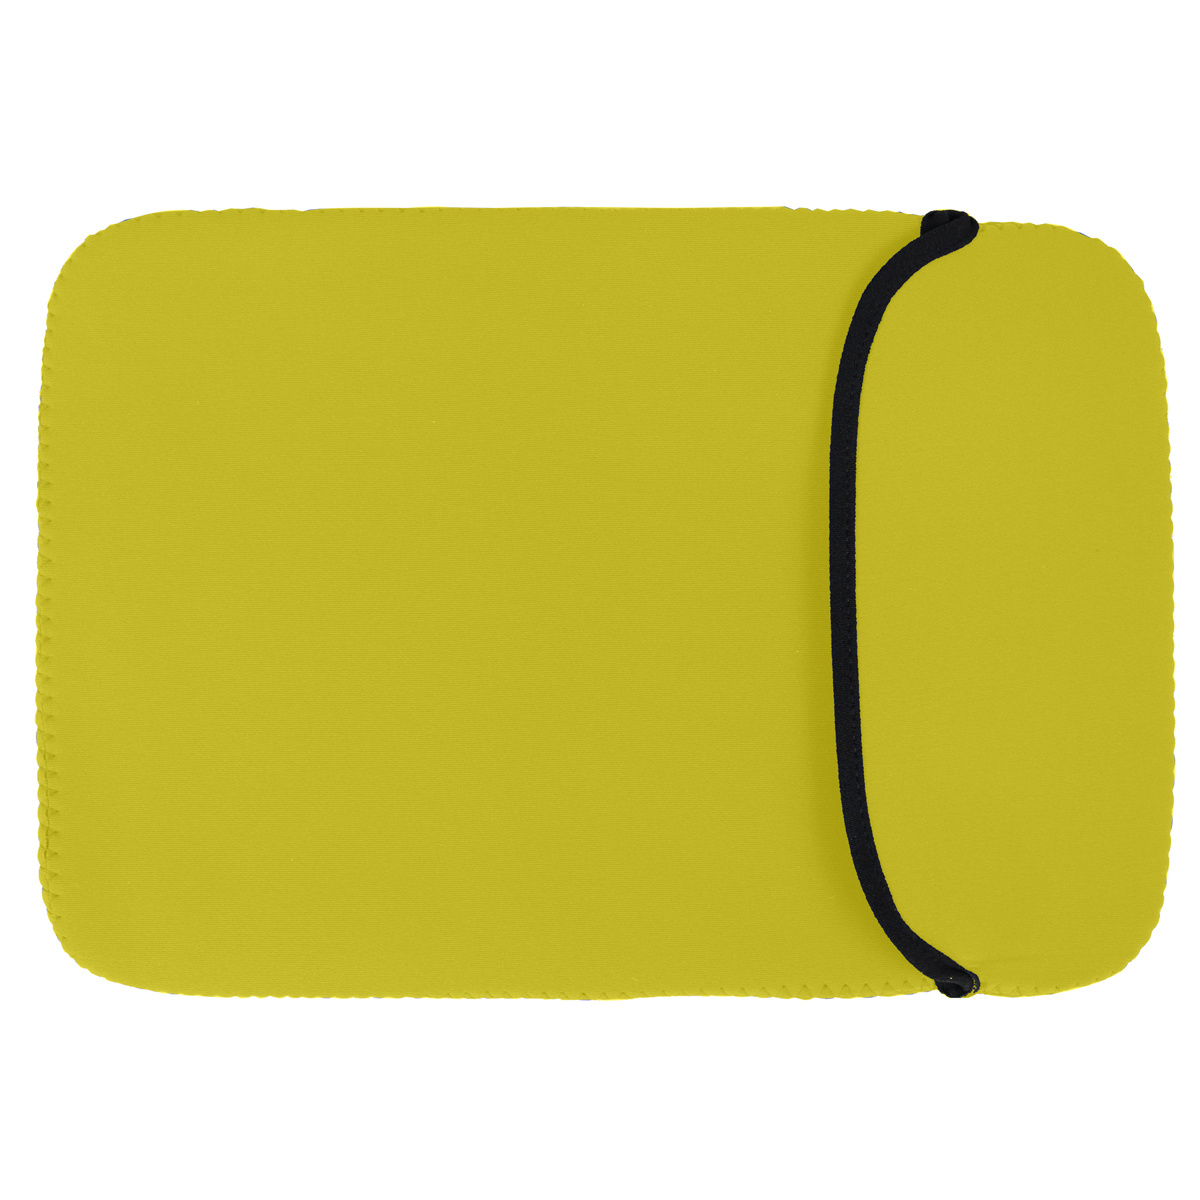 13 Inch Macbook Laptop Chromebook Neopreen sleeve case Geel